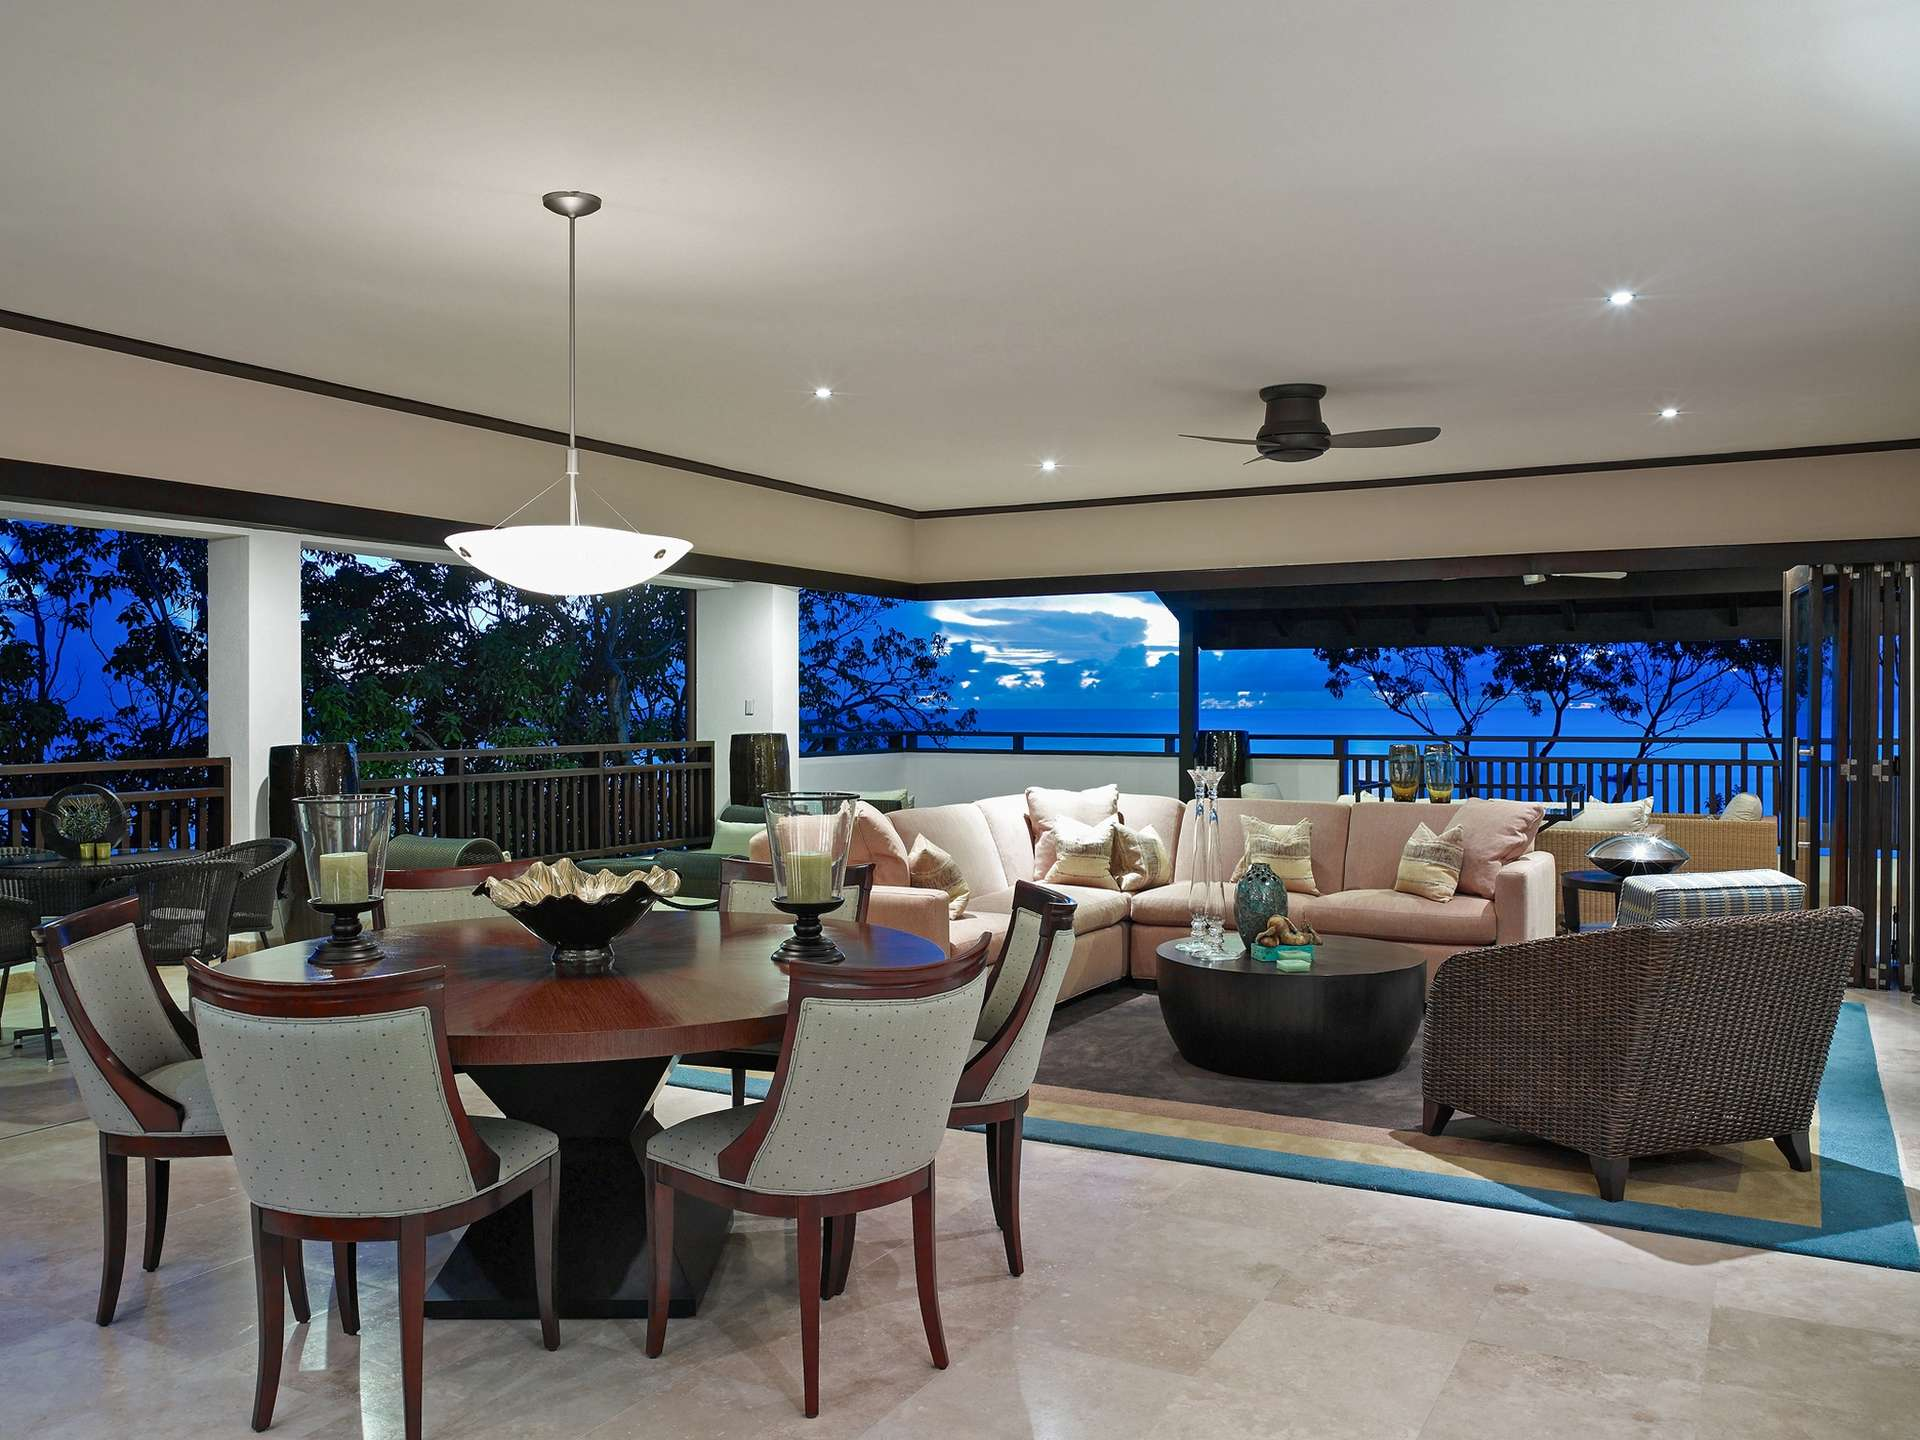 Luxury villa rentals caribbean - Barbados - St james - Coral cove - Crows Nest - Image 1/6